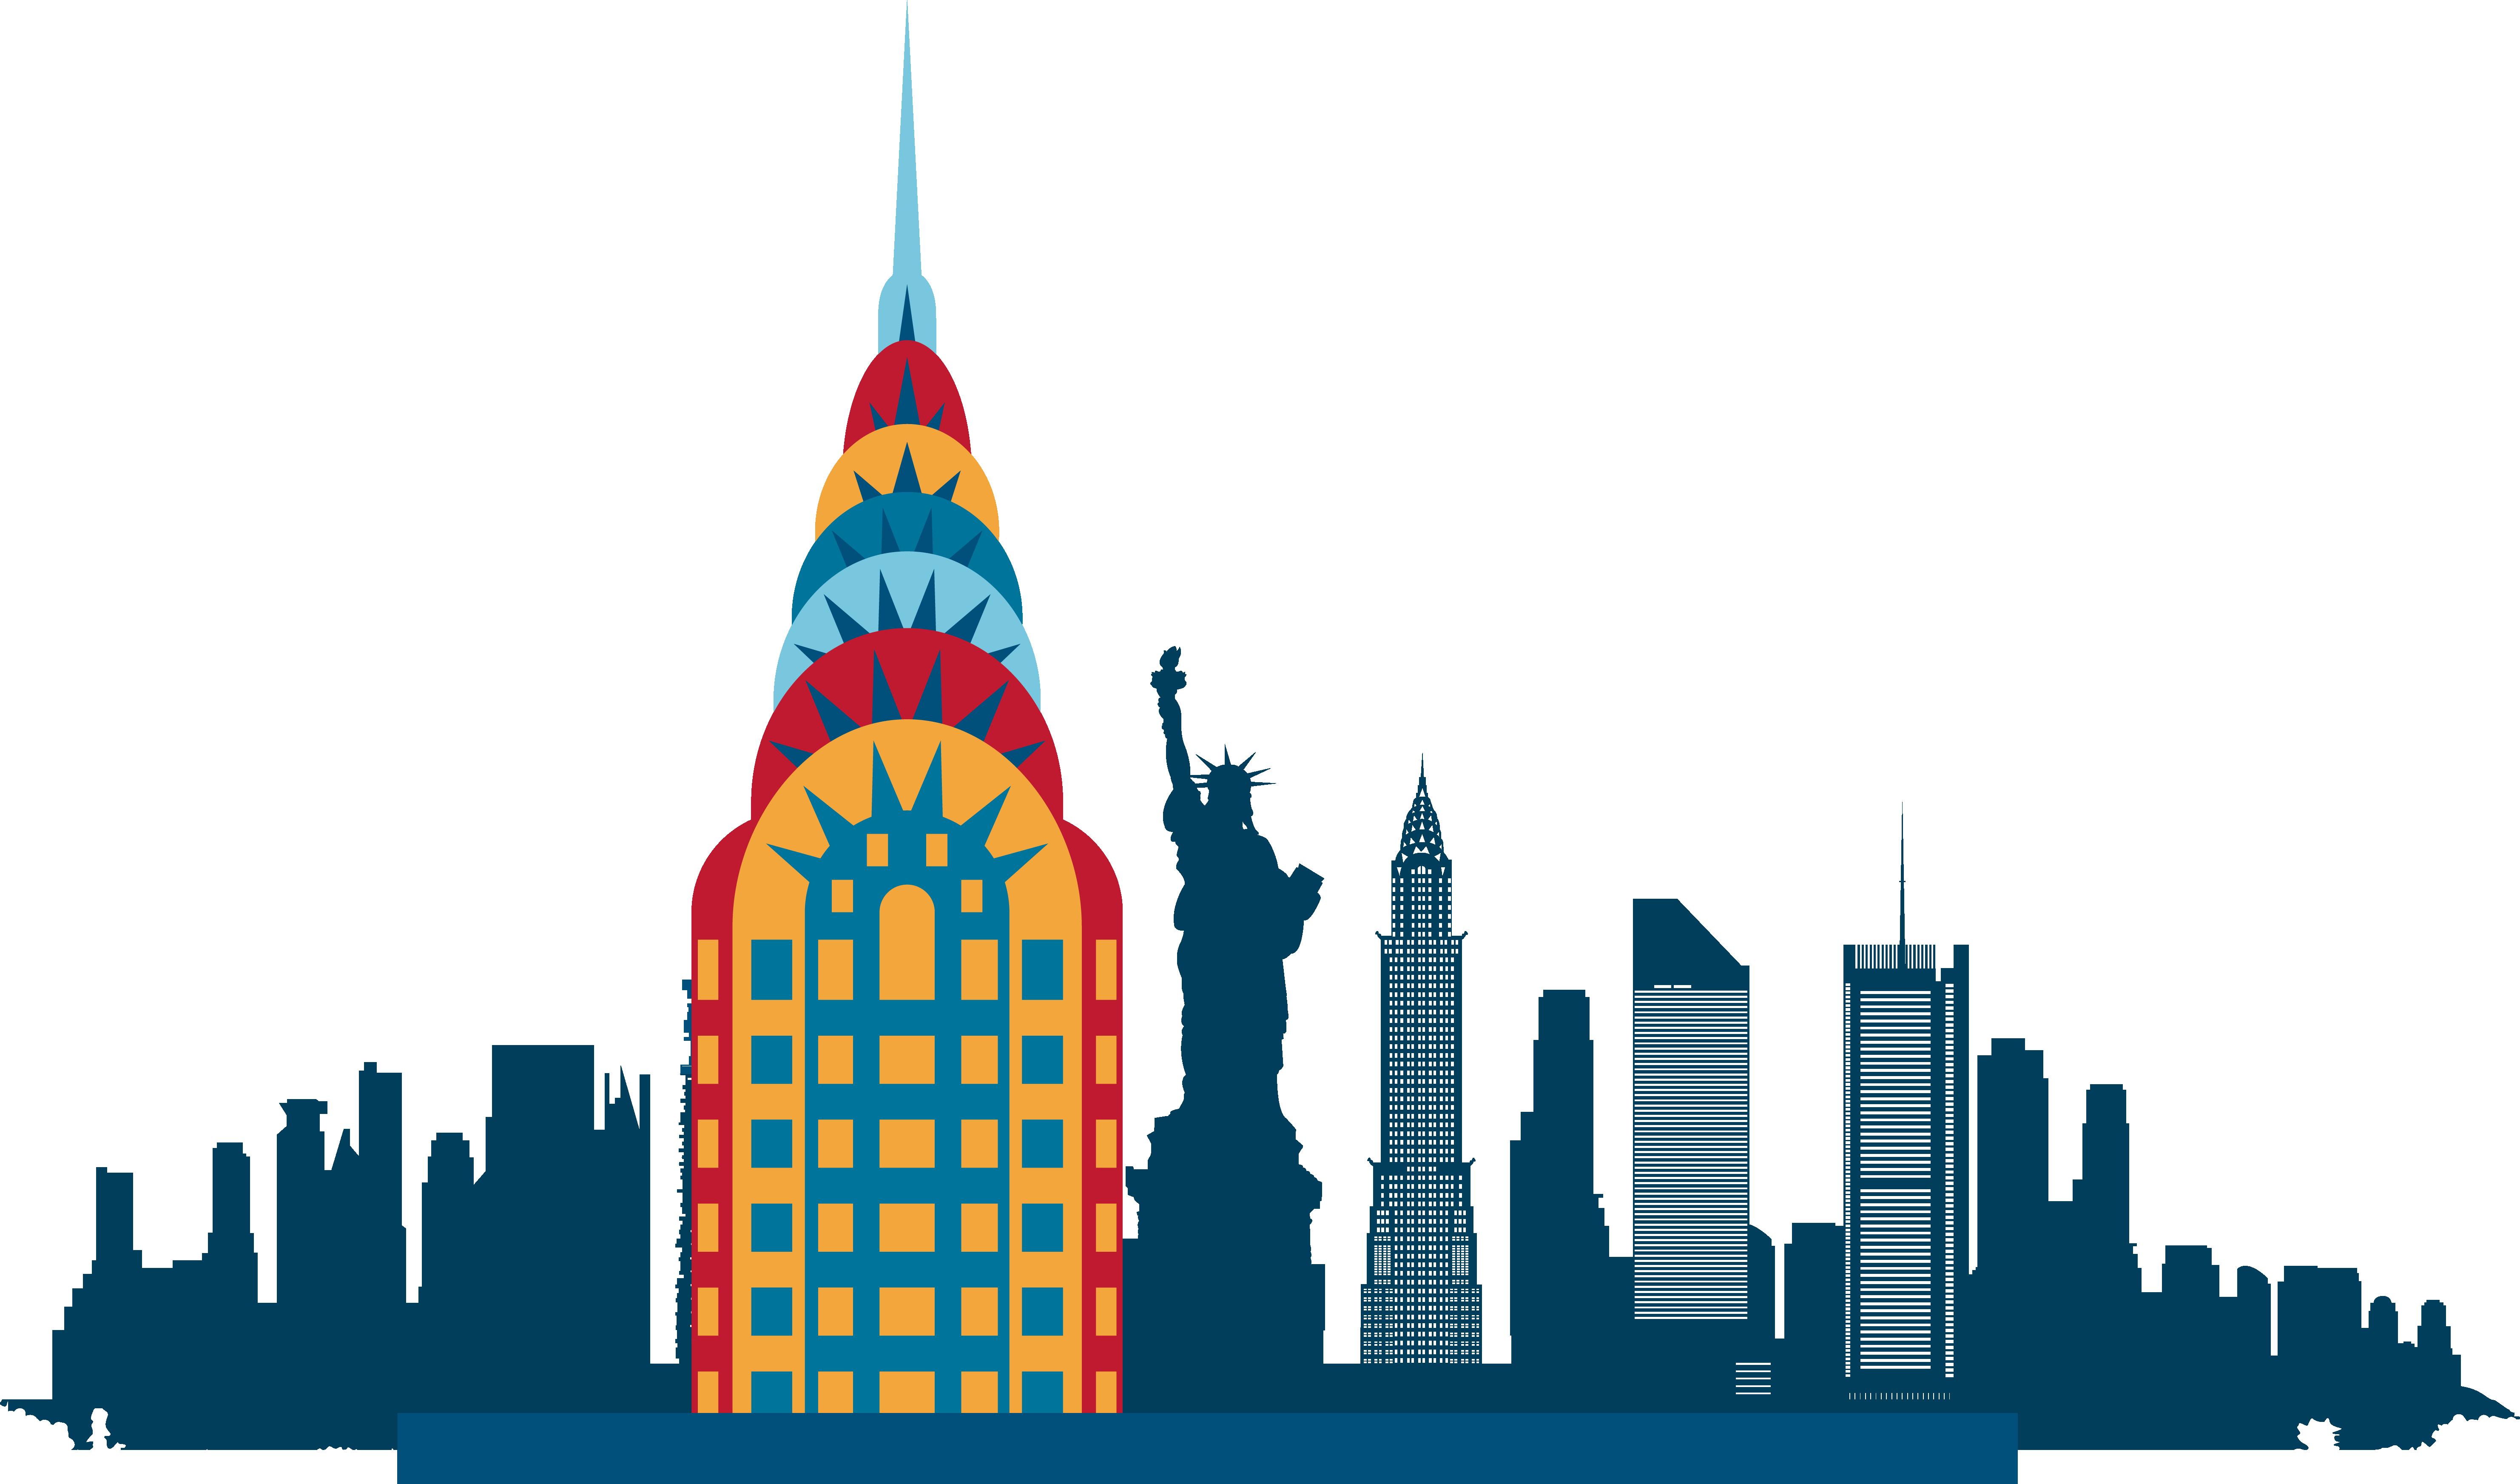 5926x3489 New York City Skyline Silhouette Illustration